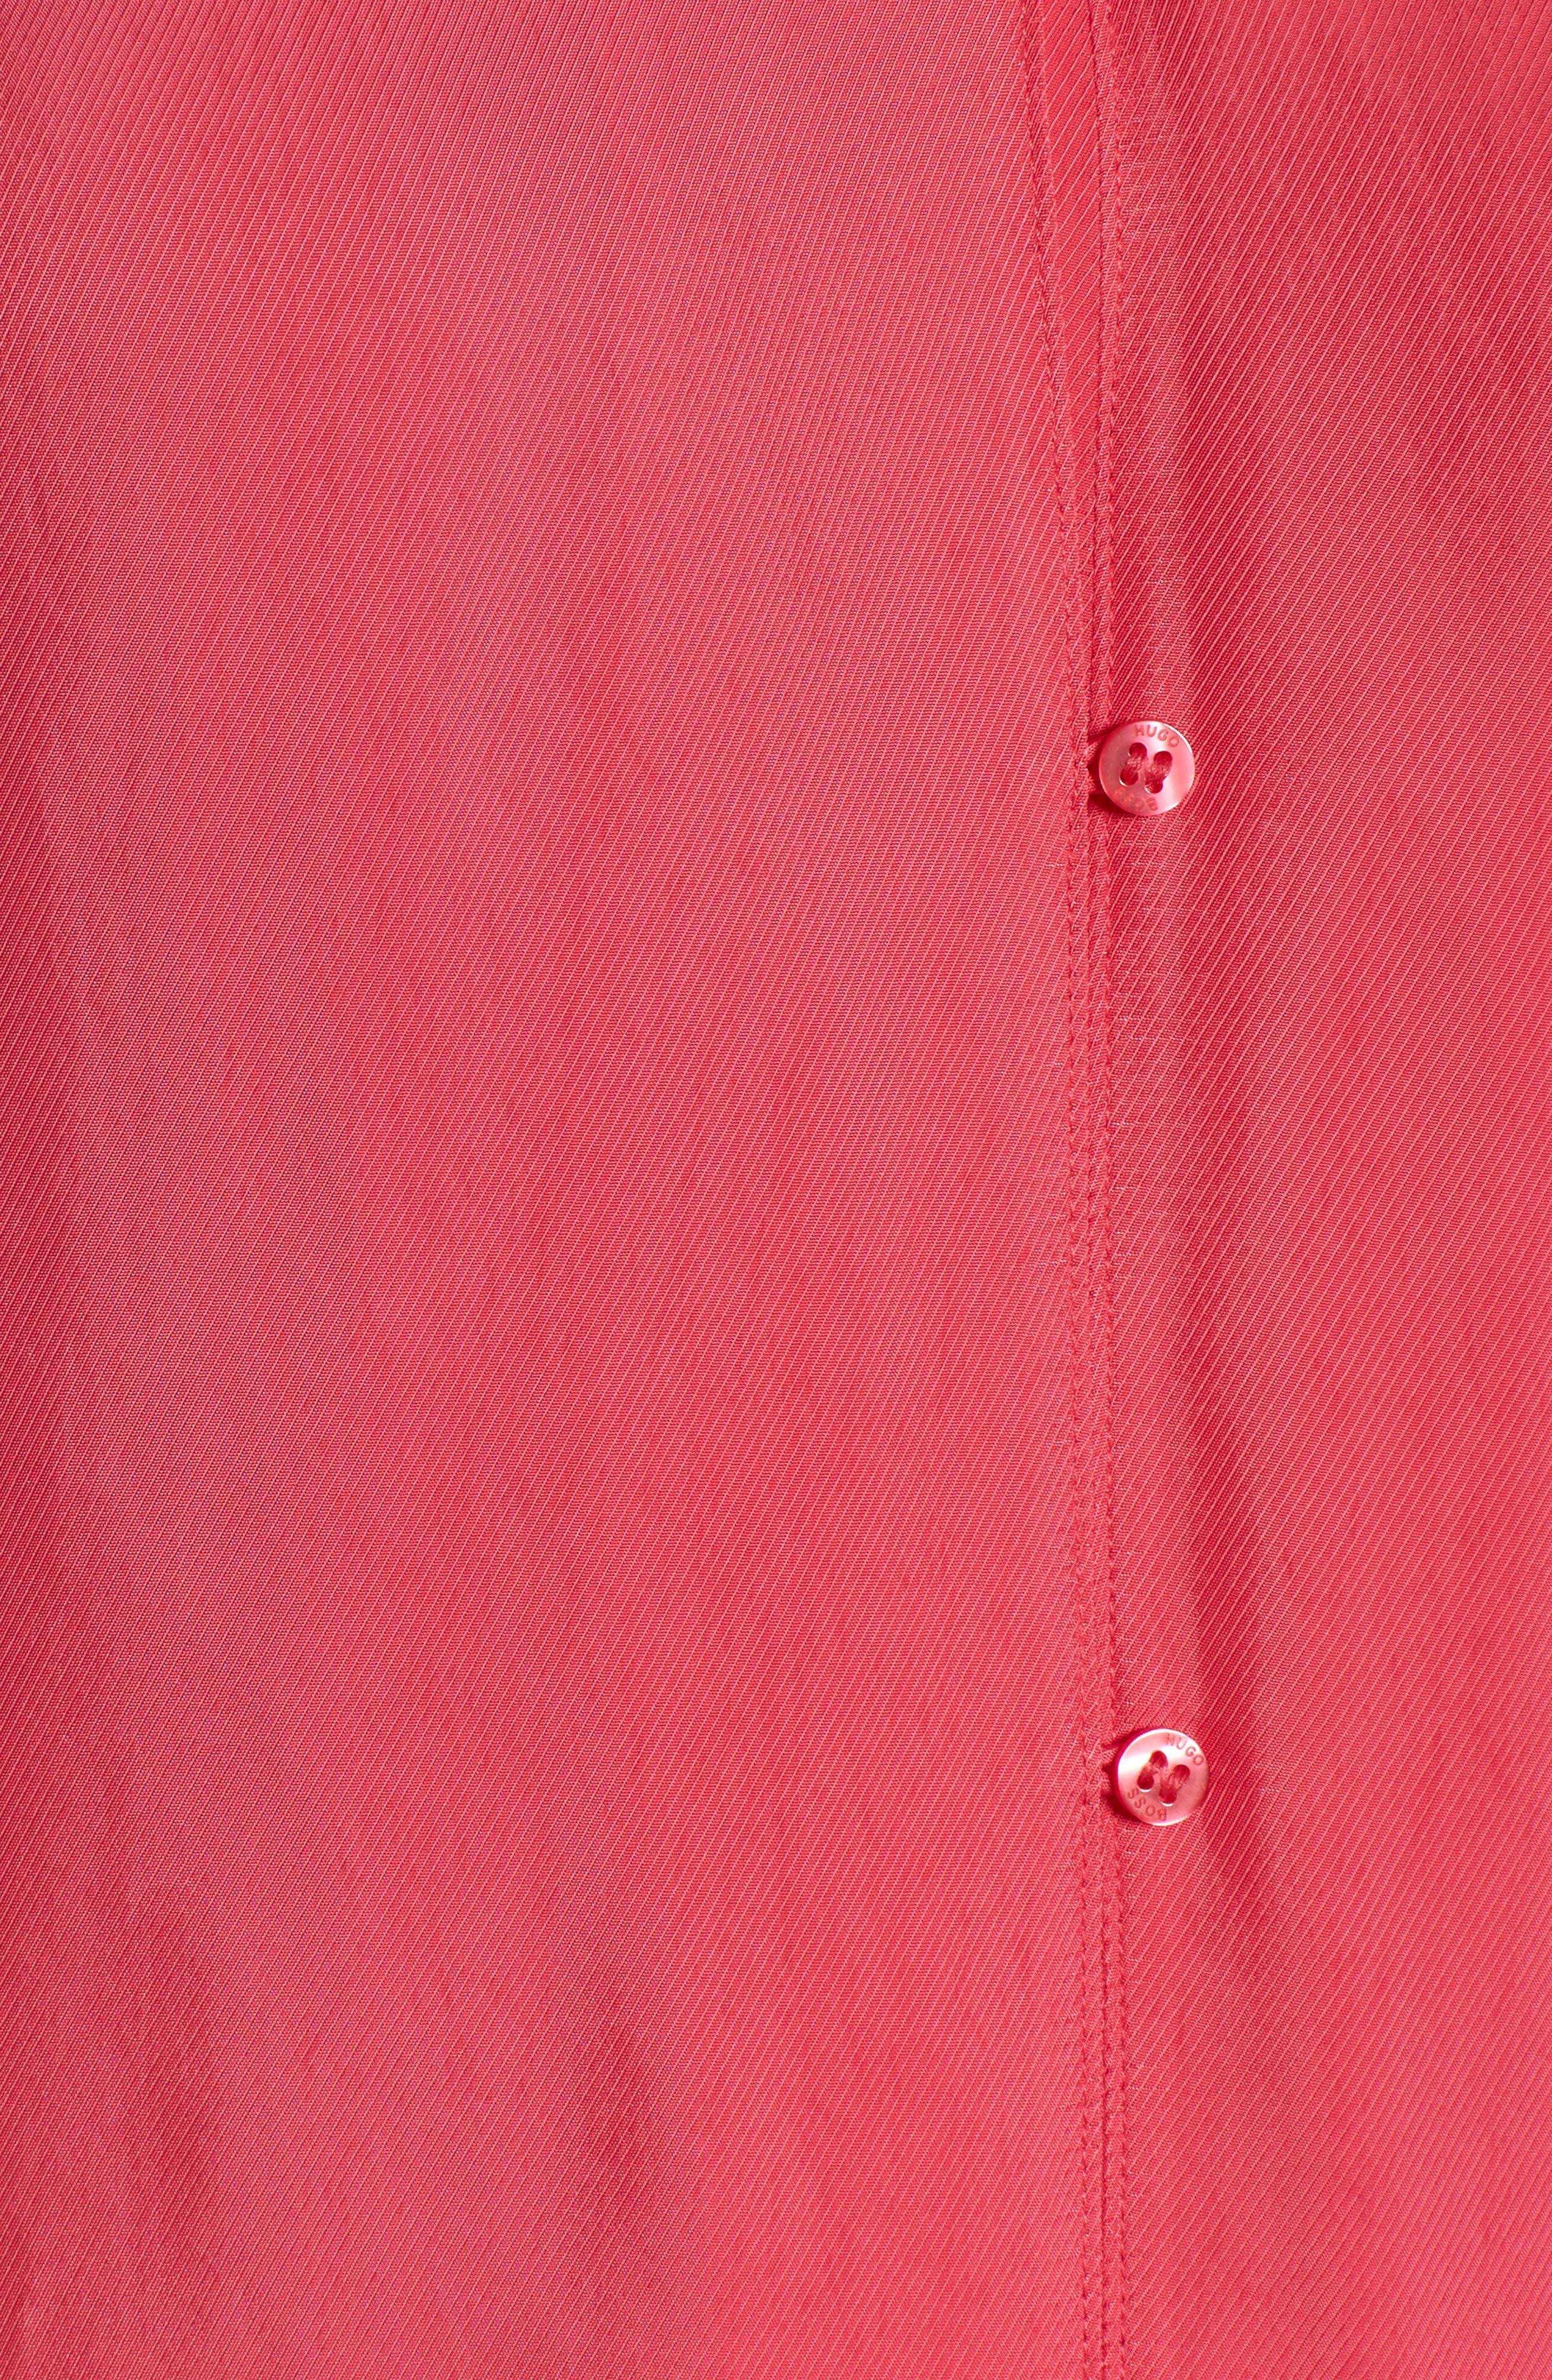 Rosalia Blouse,                             Alternate thumbnail 5, color,                             Lychee Pink